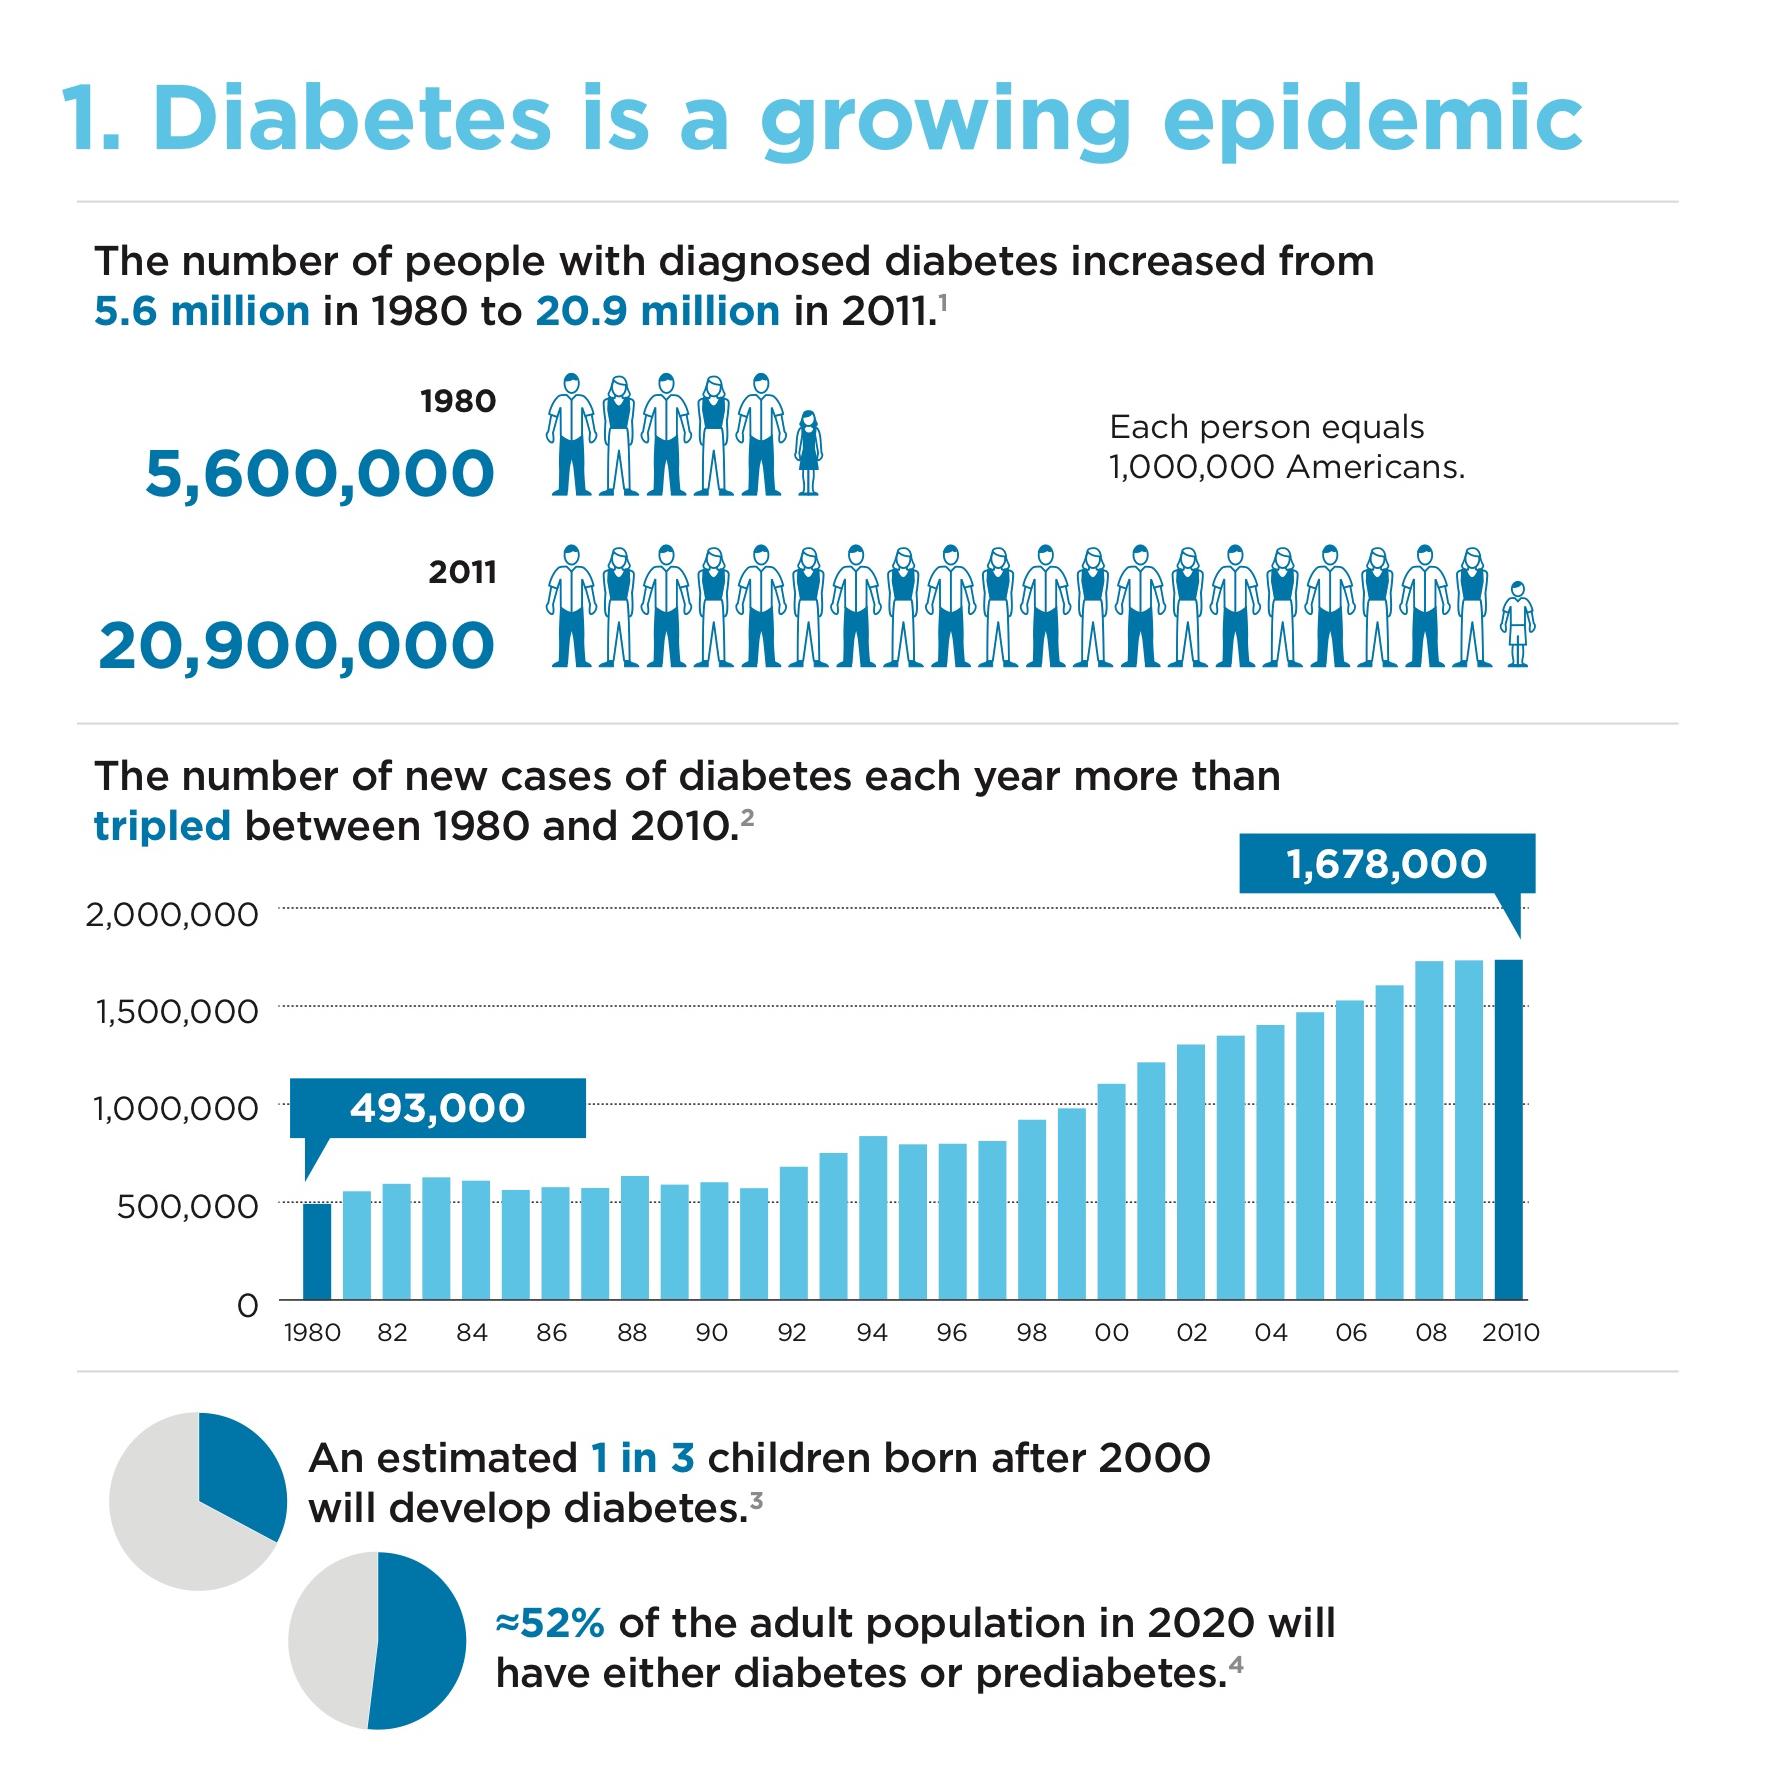 Diabetes is a Growing Epidemic